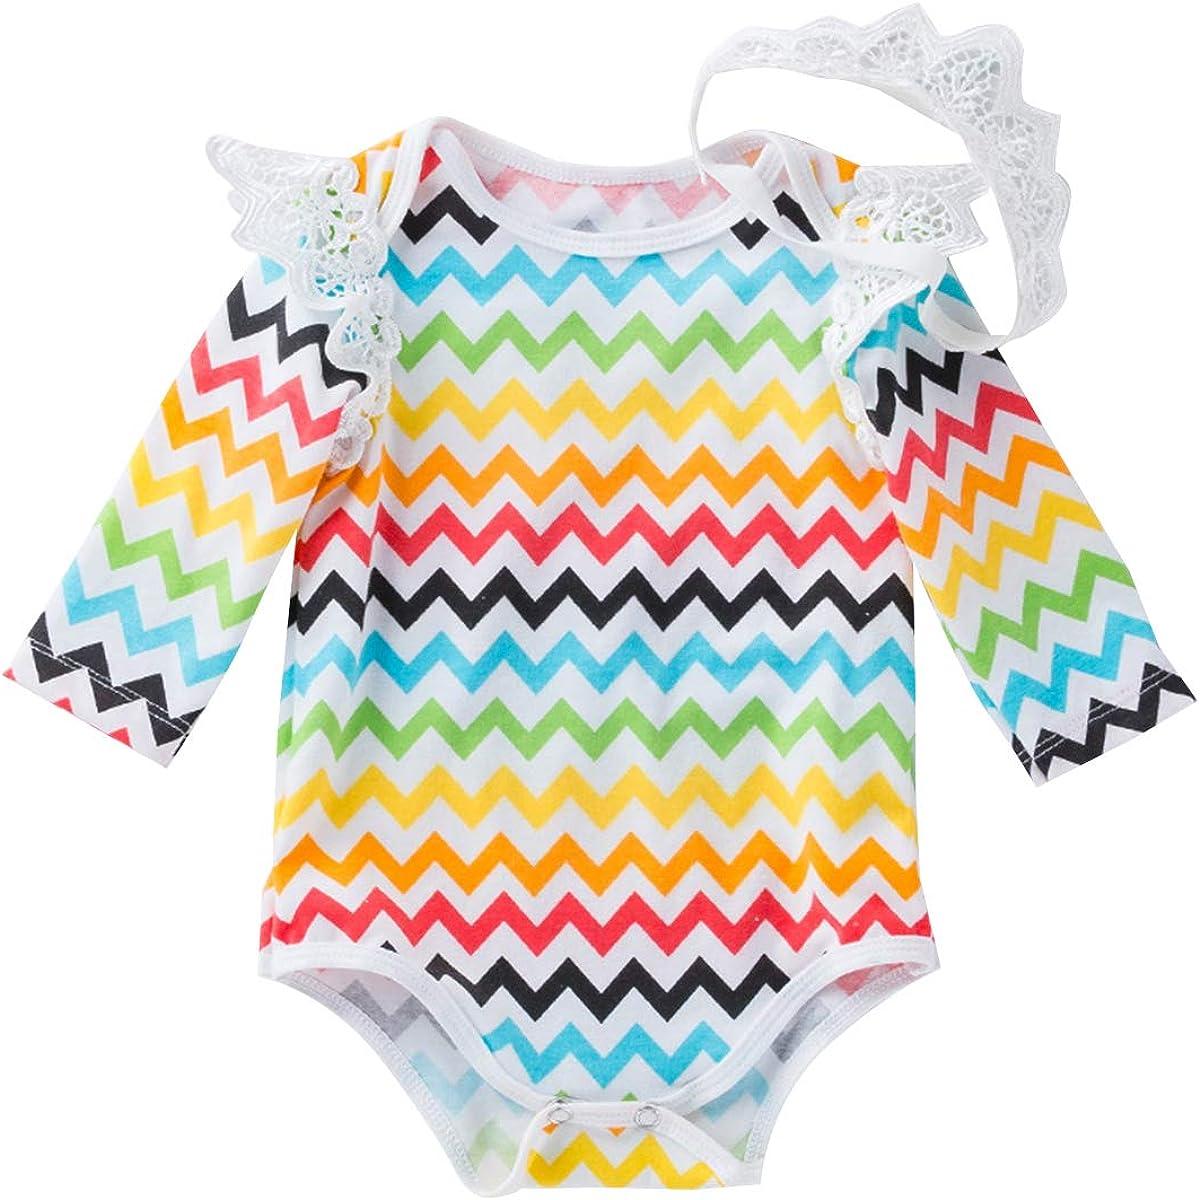 IWEMEK My 1st Easter Outfit Baby Girls 3PCs Romper Tutu Skirt Bunny Eggs Printed Long Sleeve Bodysuit Headband Clothes